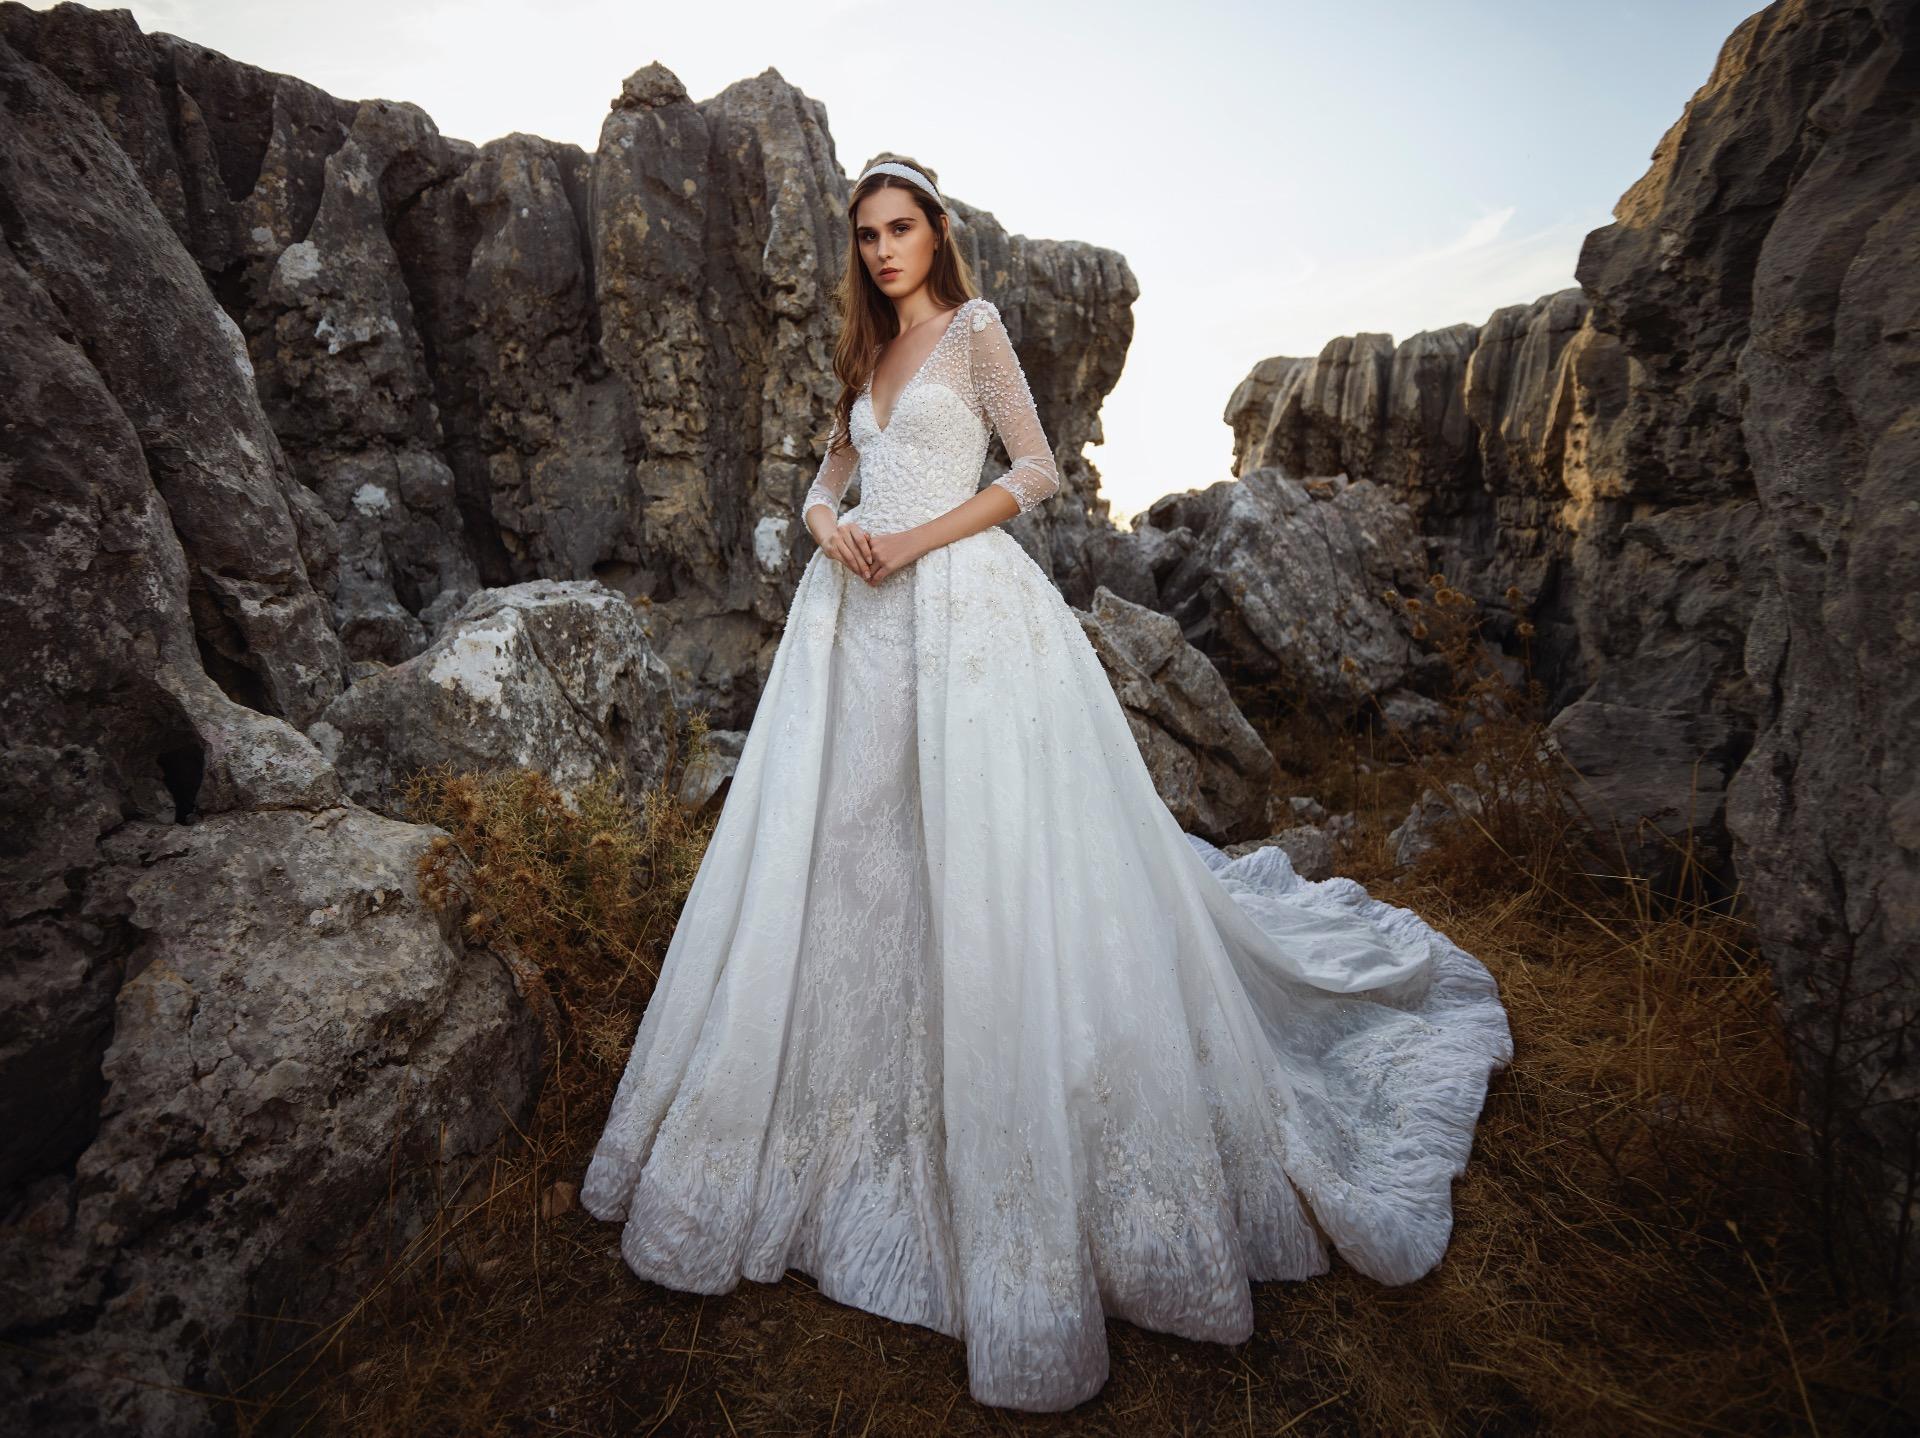 Moon bridal gown by Tony Ward